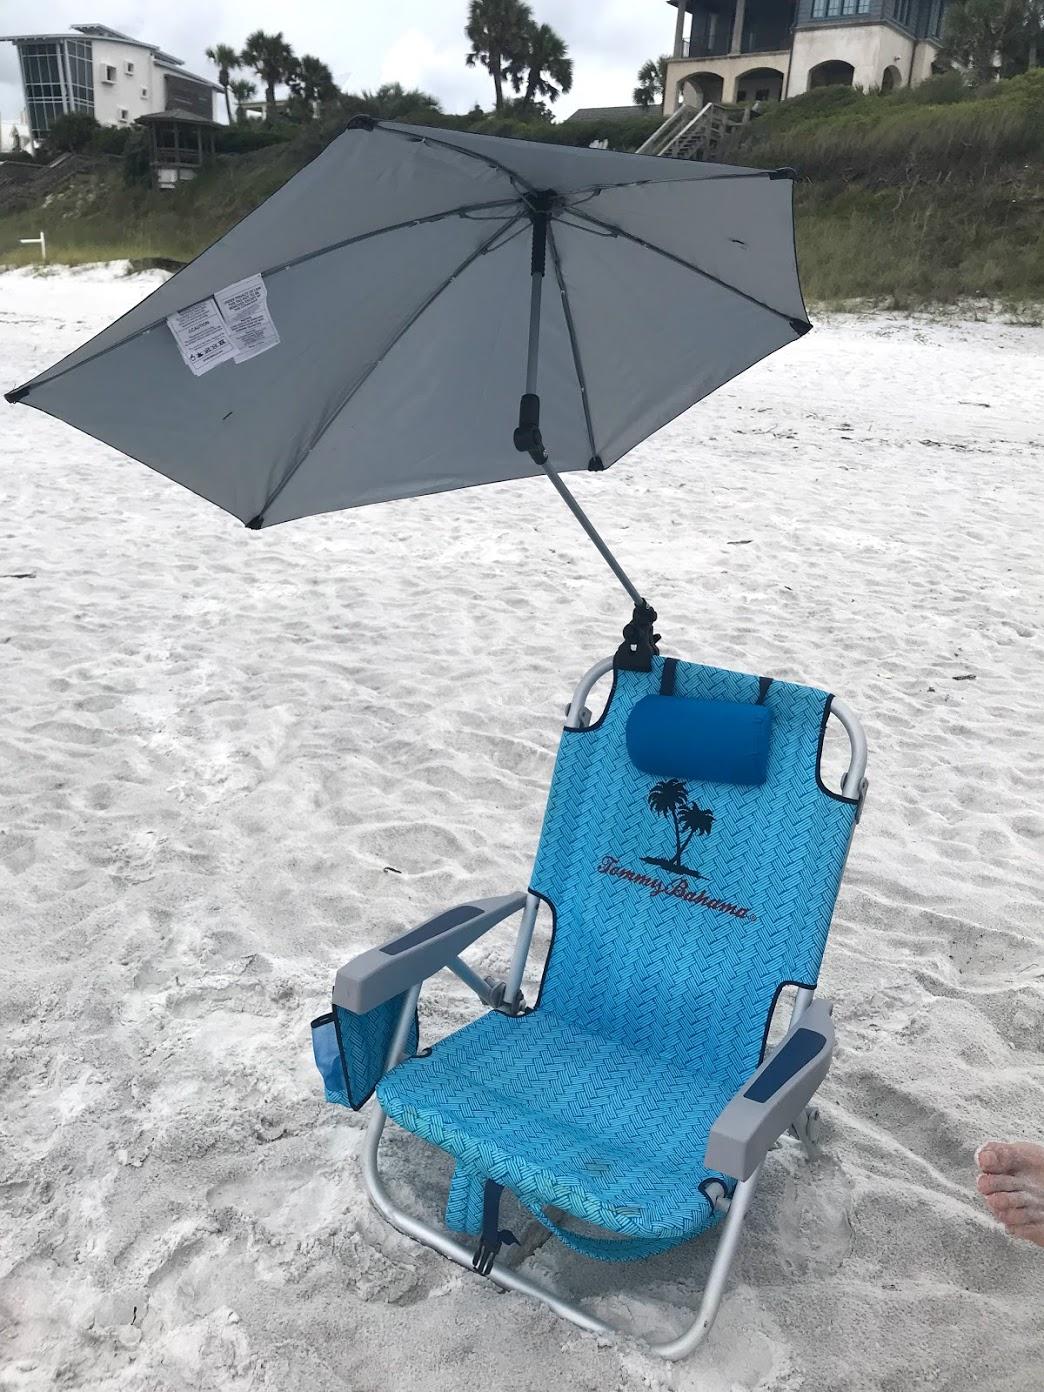 Tommy Bahama Beach Chairs